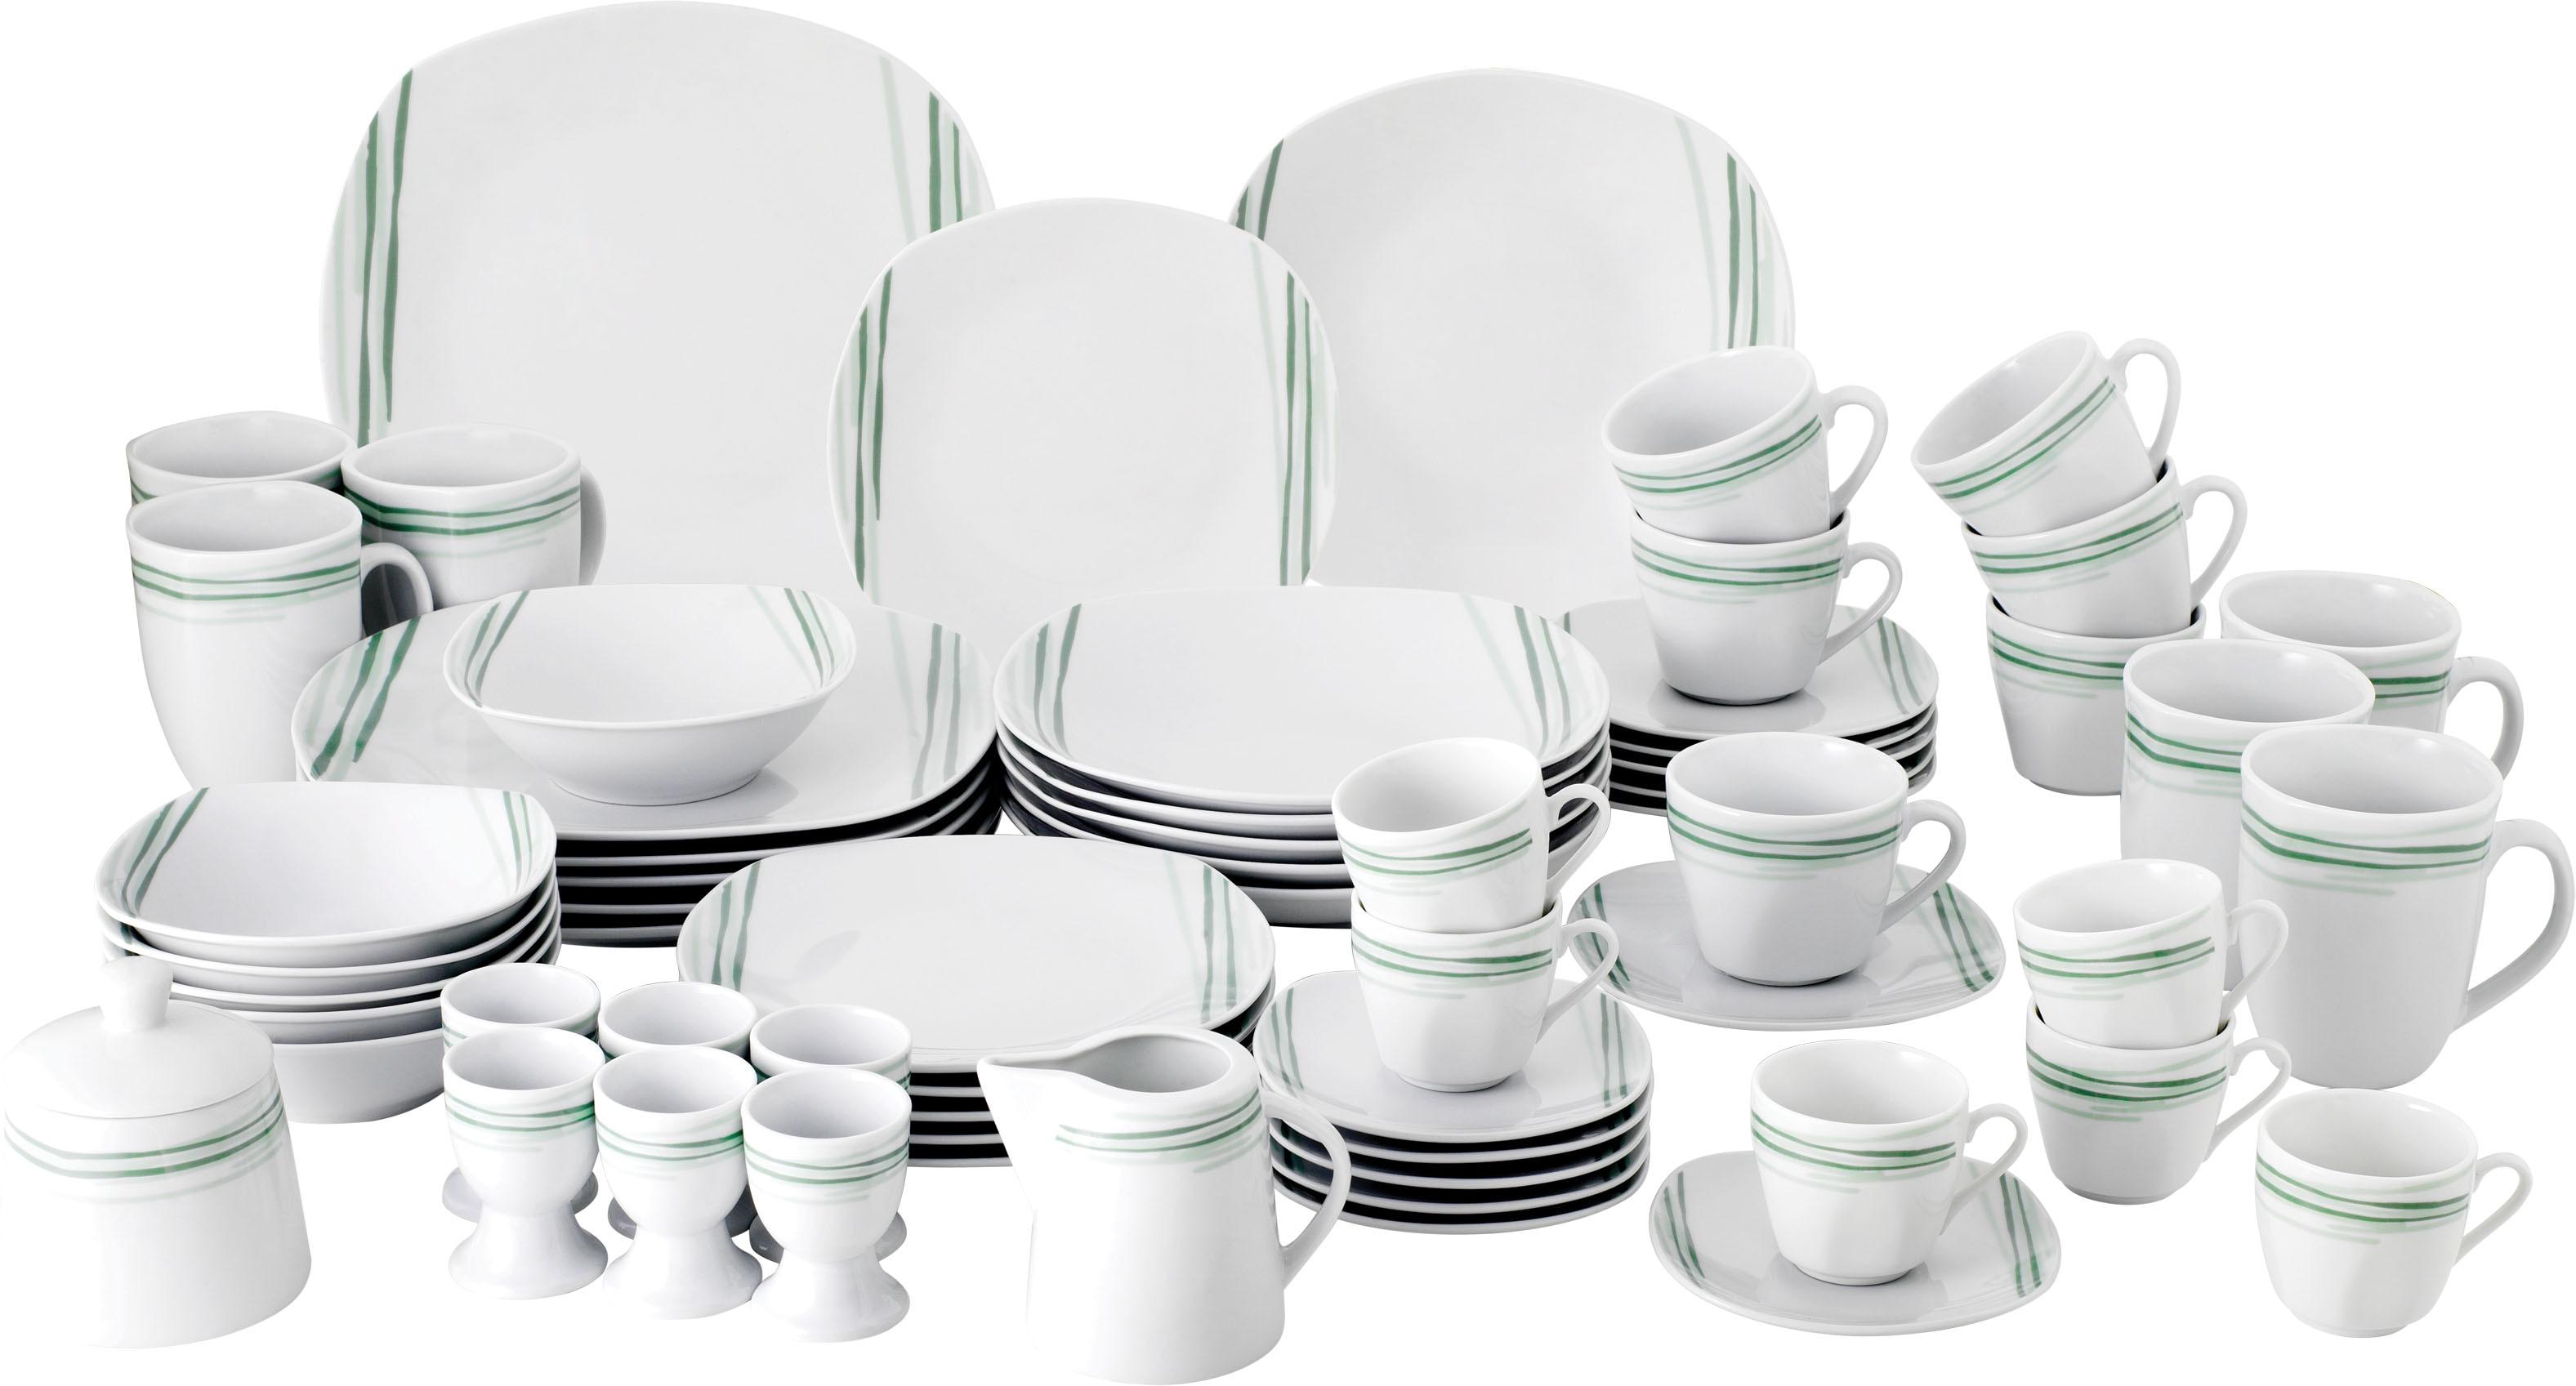 van Well Geschirr-Set Soraya, (Set, 62 tlg.), Eckige Form weiß Geschirr-Sets Geschirr, Porzellan Tischaccessoires Haushaltswaren